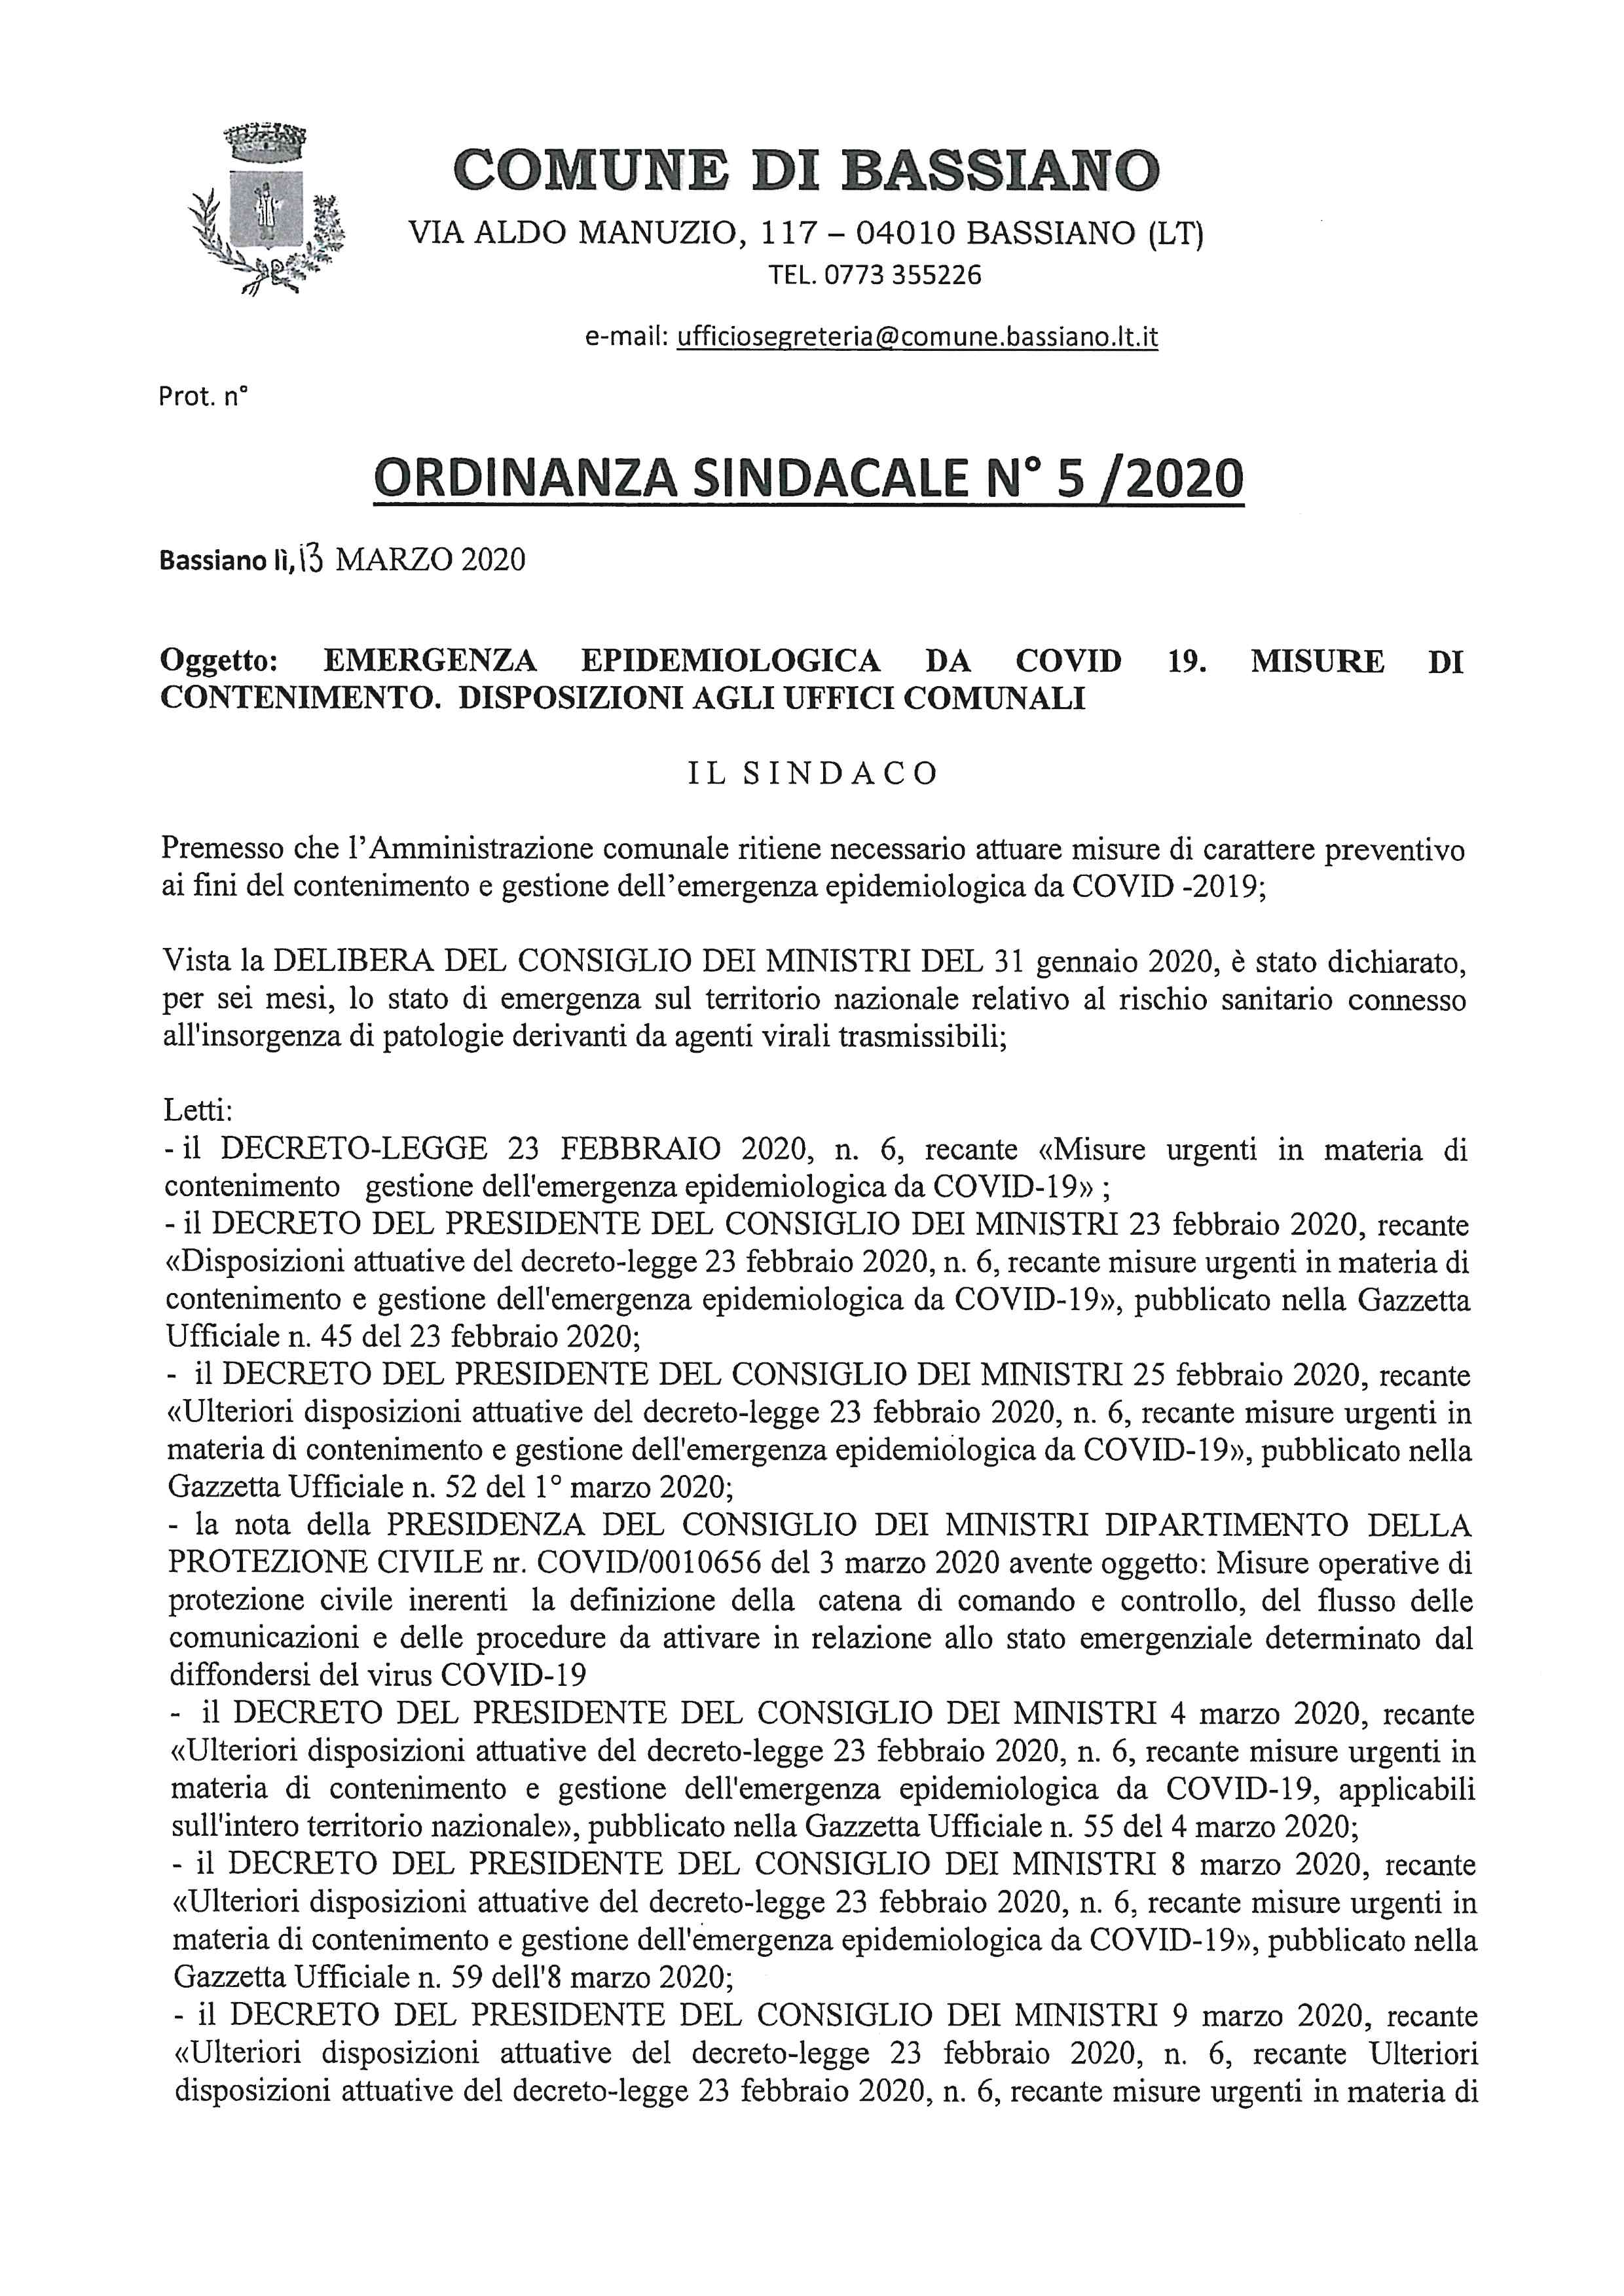 ORDINANZA SINDACALE N. 5/2020